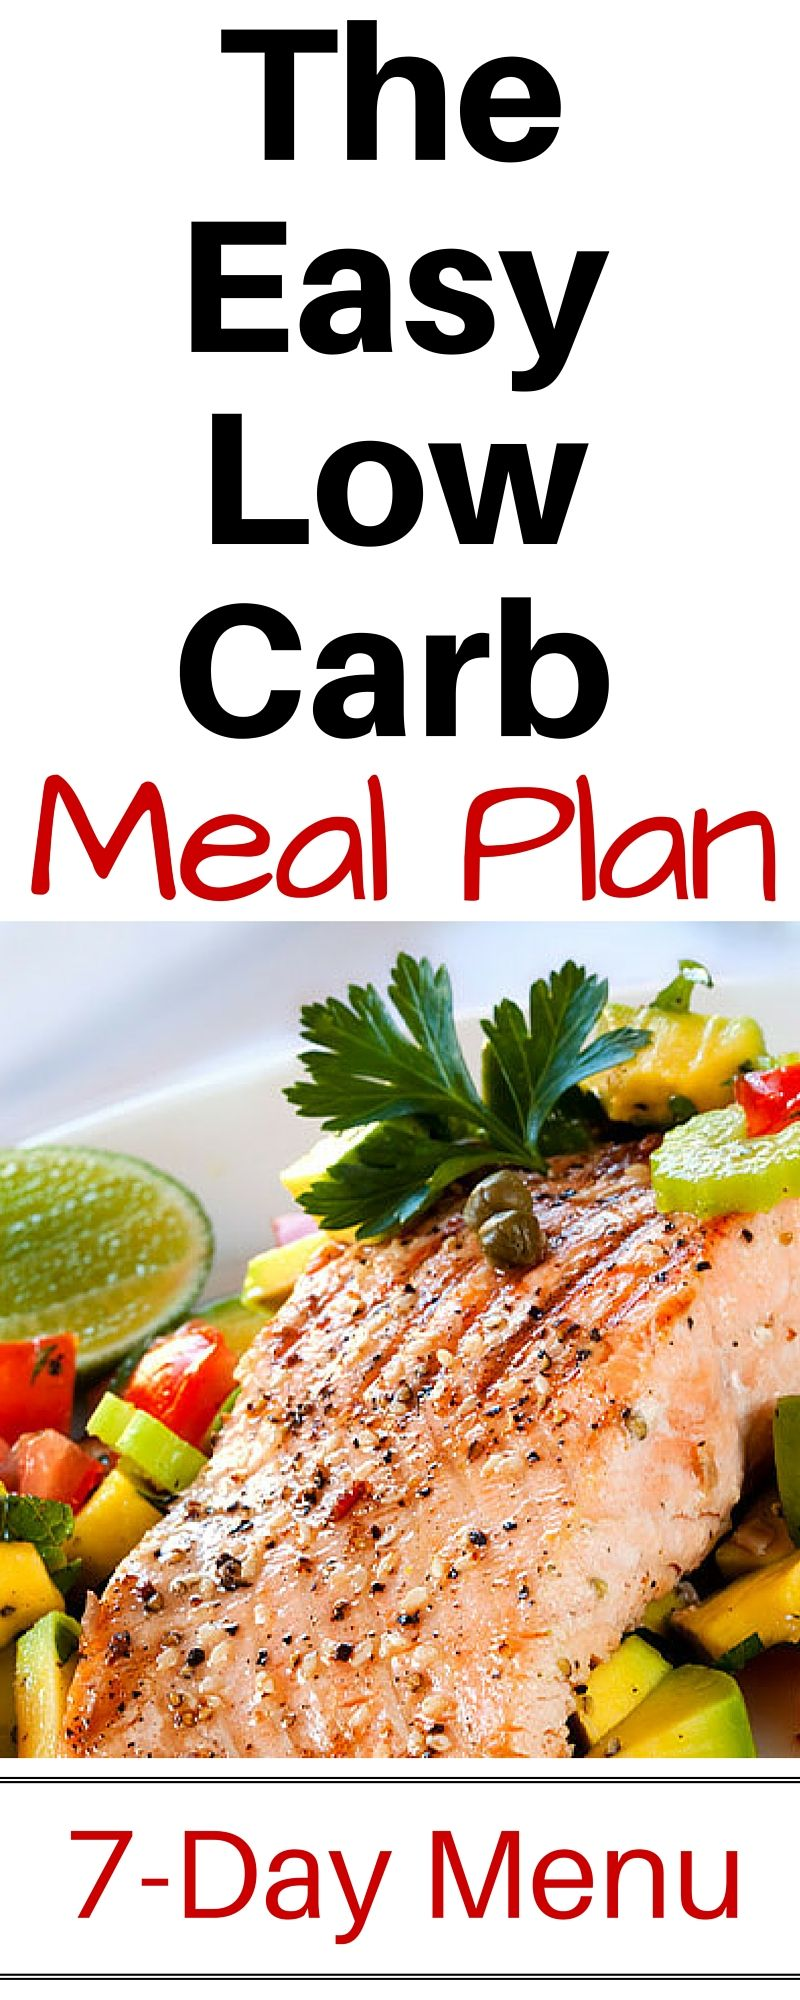 LowCarb Meal Plan Low carb meal plan, Low carb menus